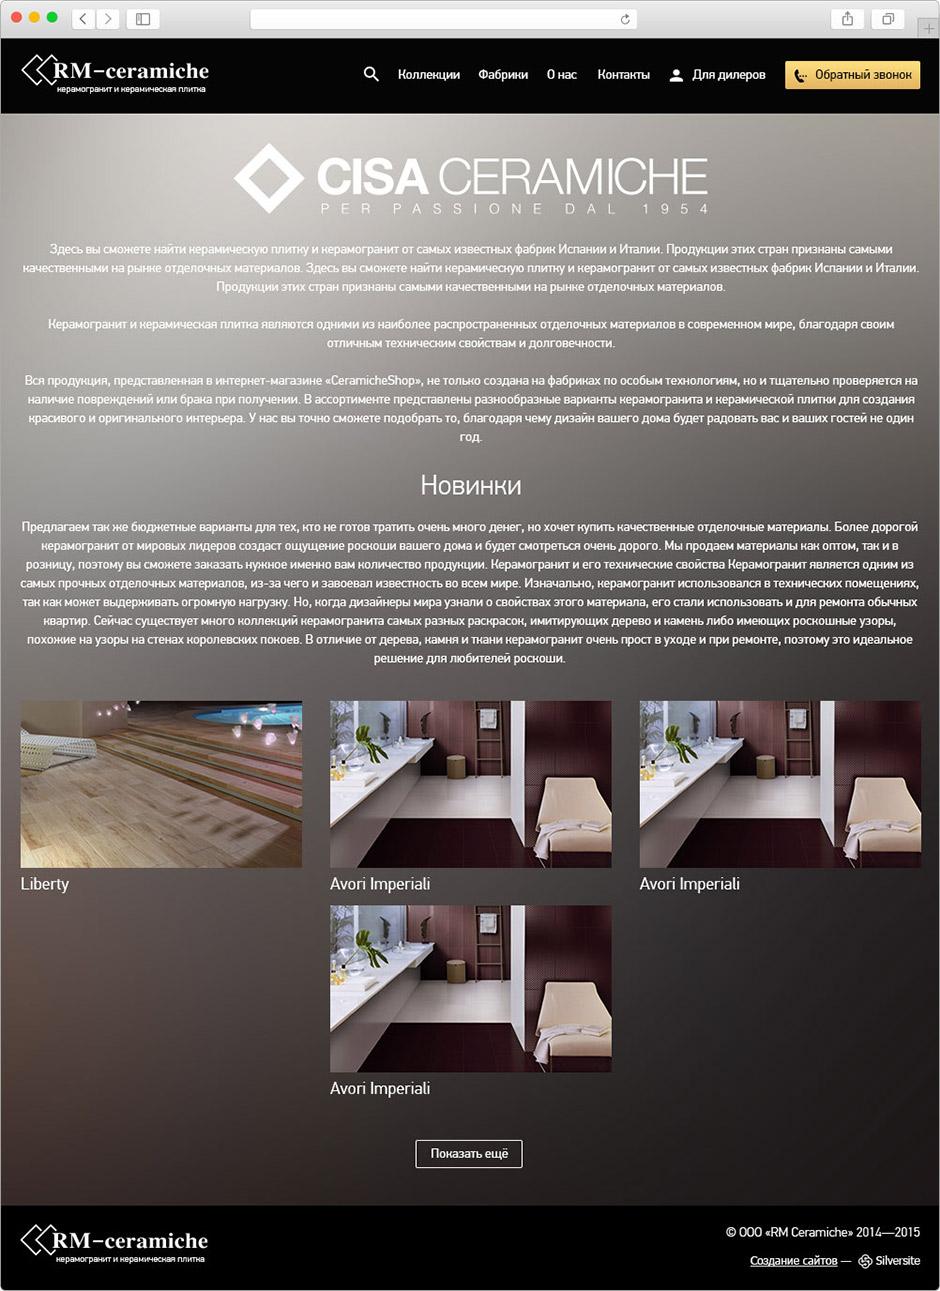 e84431e72cb6 Клиент  Онлайн-шоурум элитной итальянской плитки RM-CERAMICHE